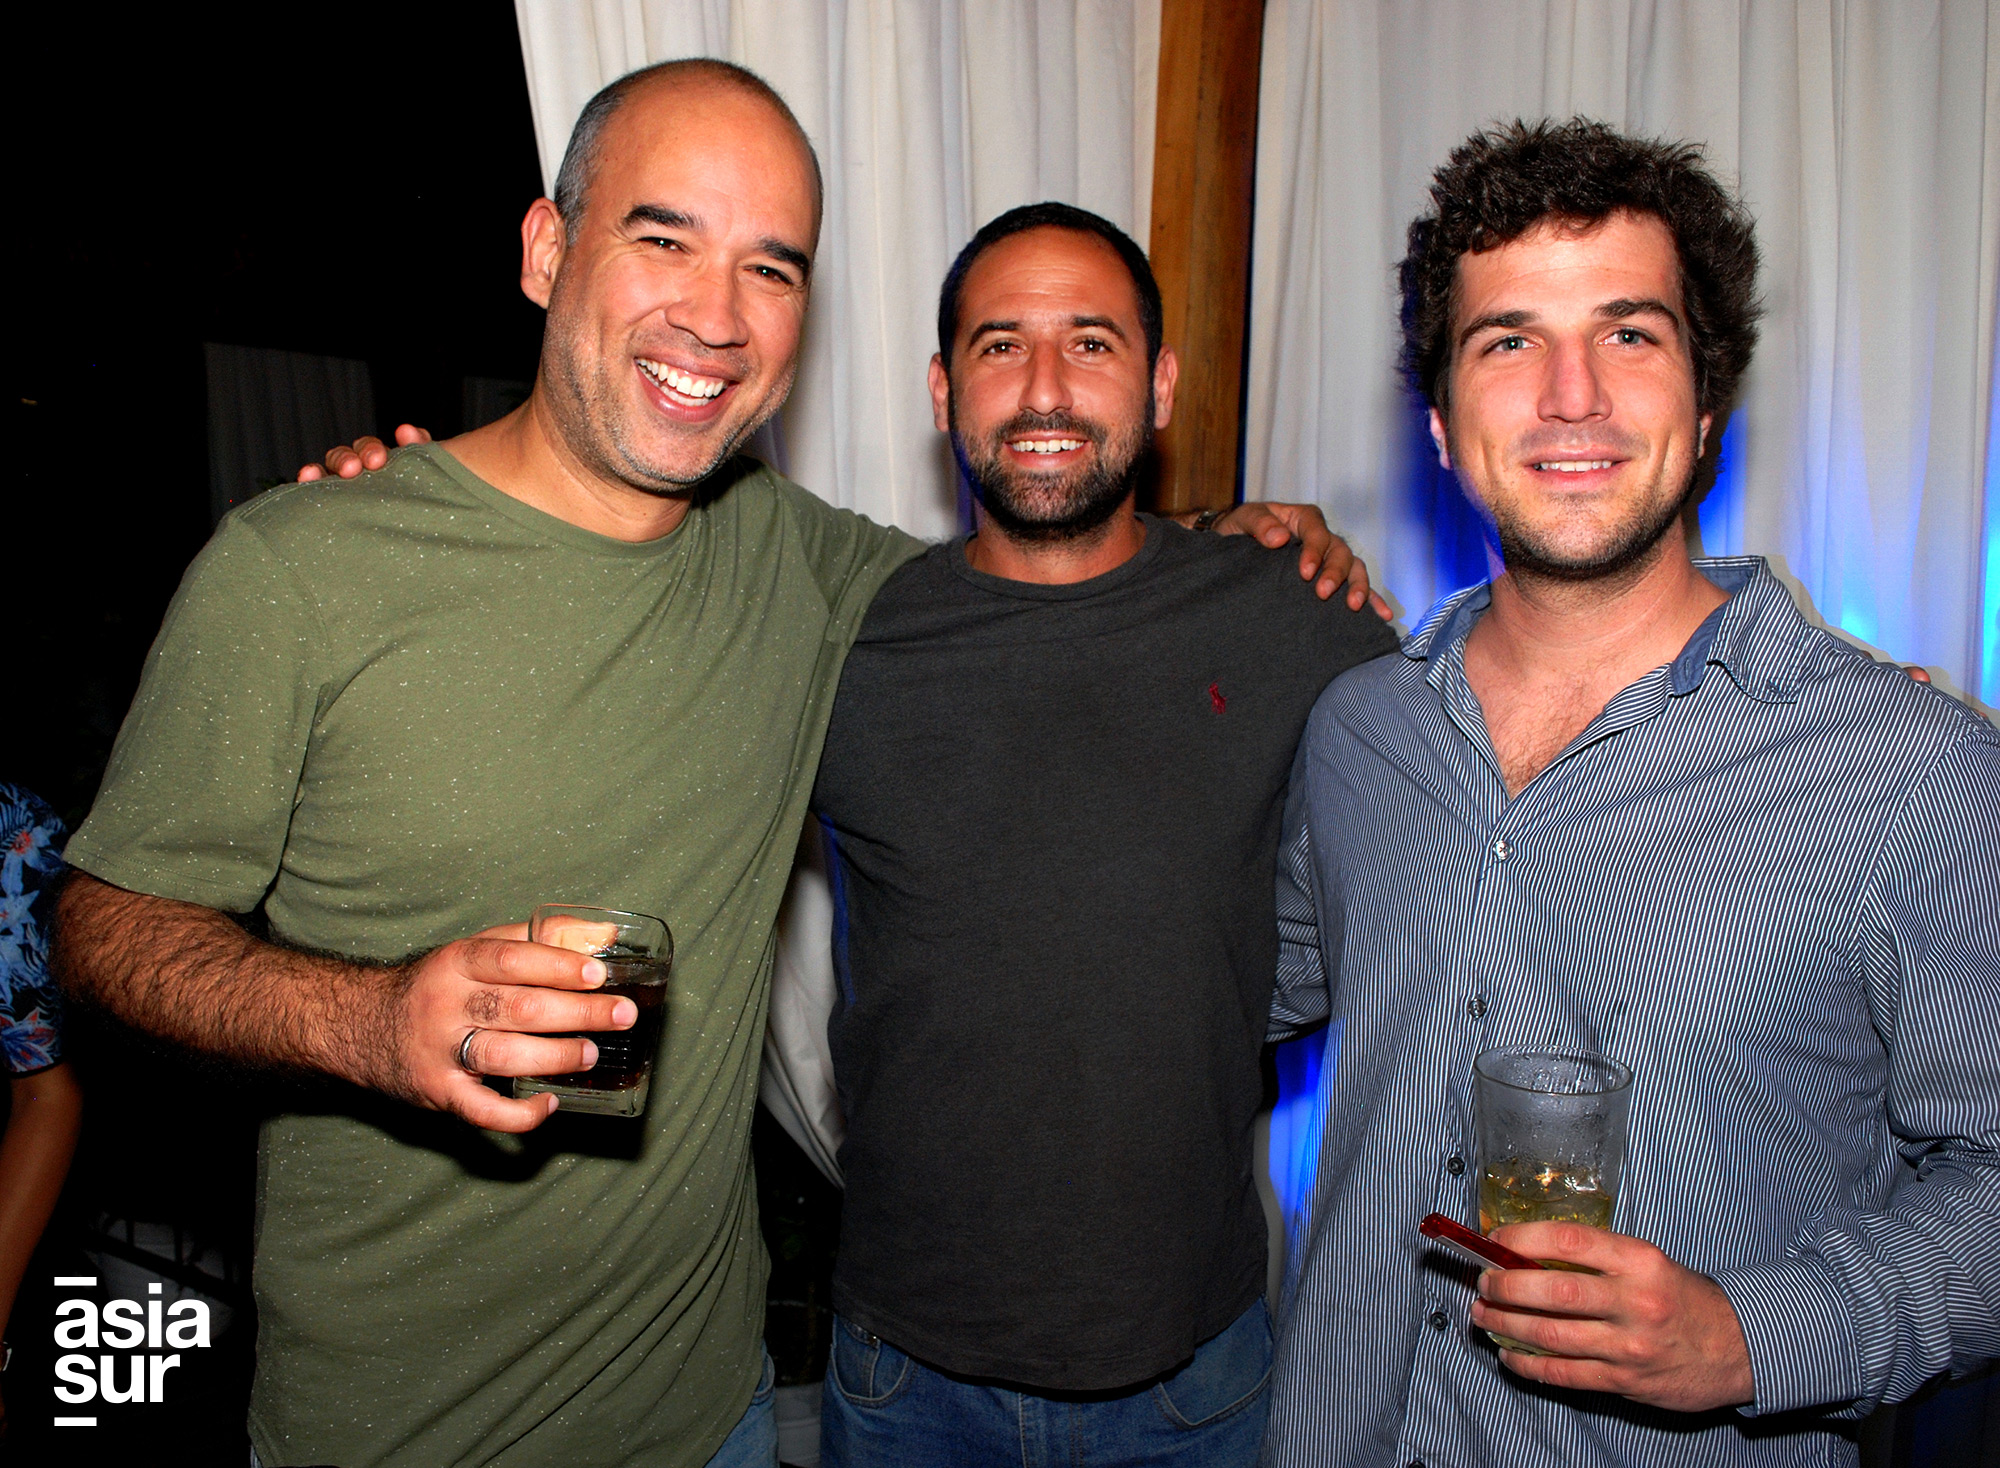 Diego del Pomar, Javier Bambarén y Stefano Lulli